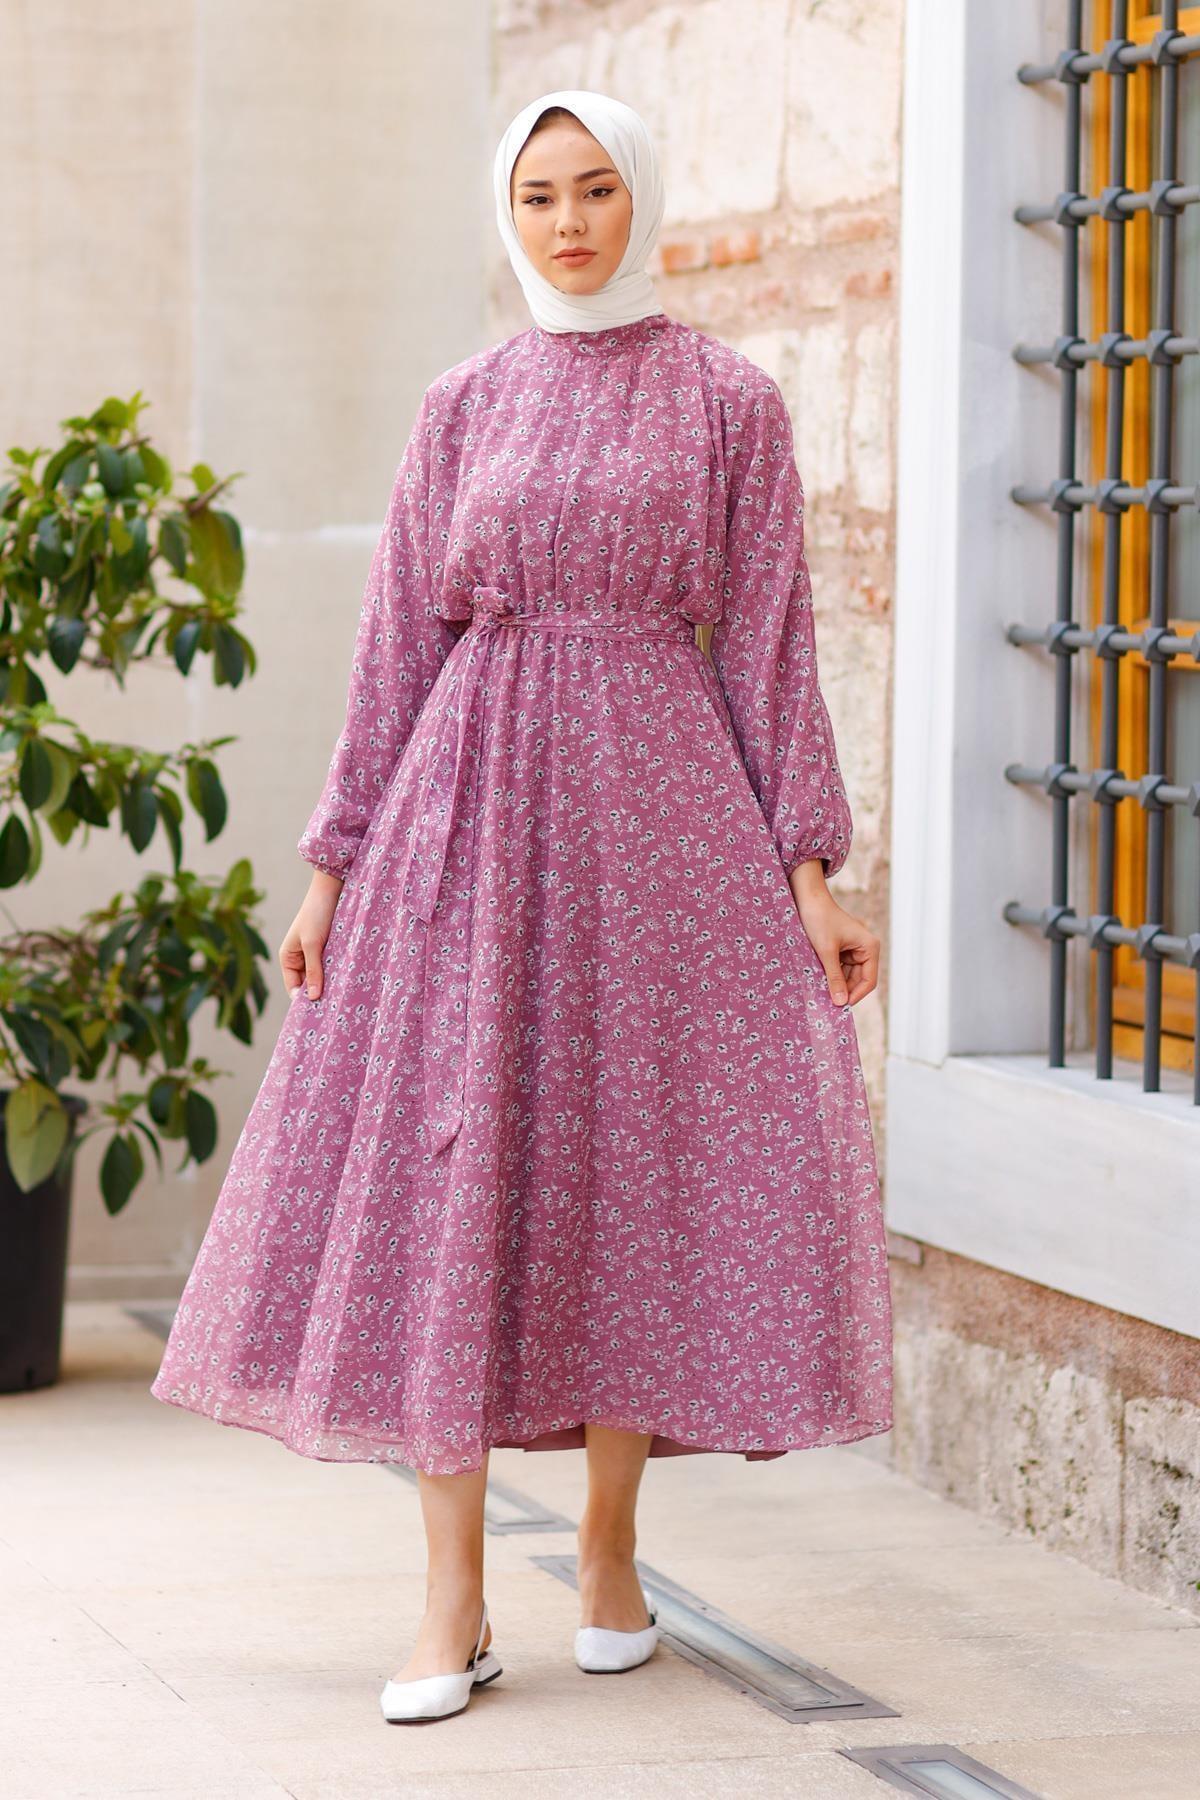 meqlife Kadın Flower 2021 New Season Dress Elbise